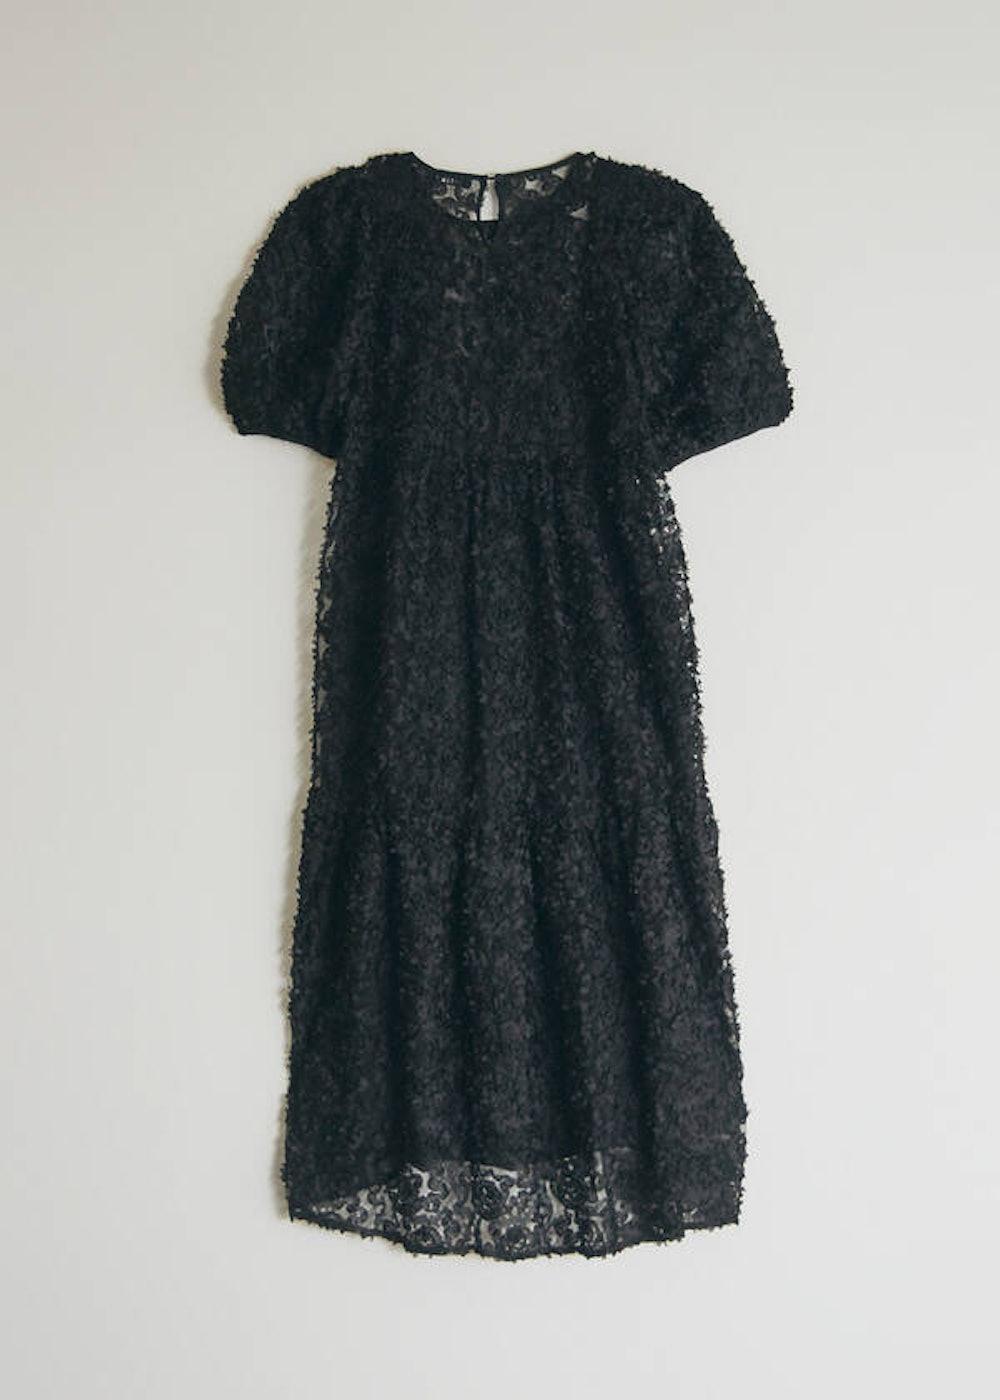 Auriele Midi Dress in Black